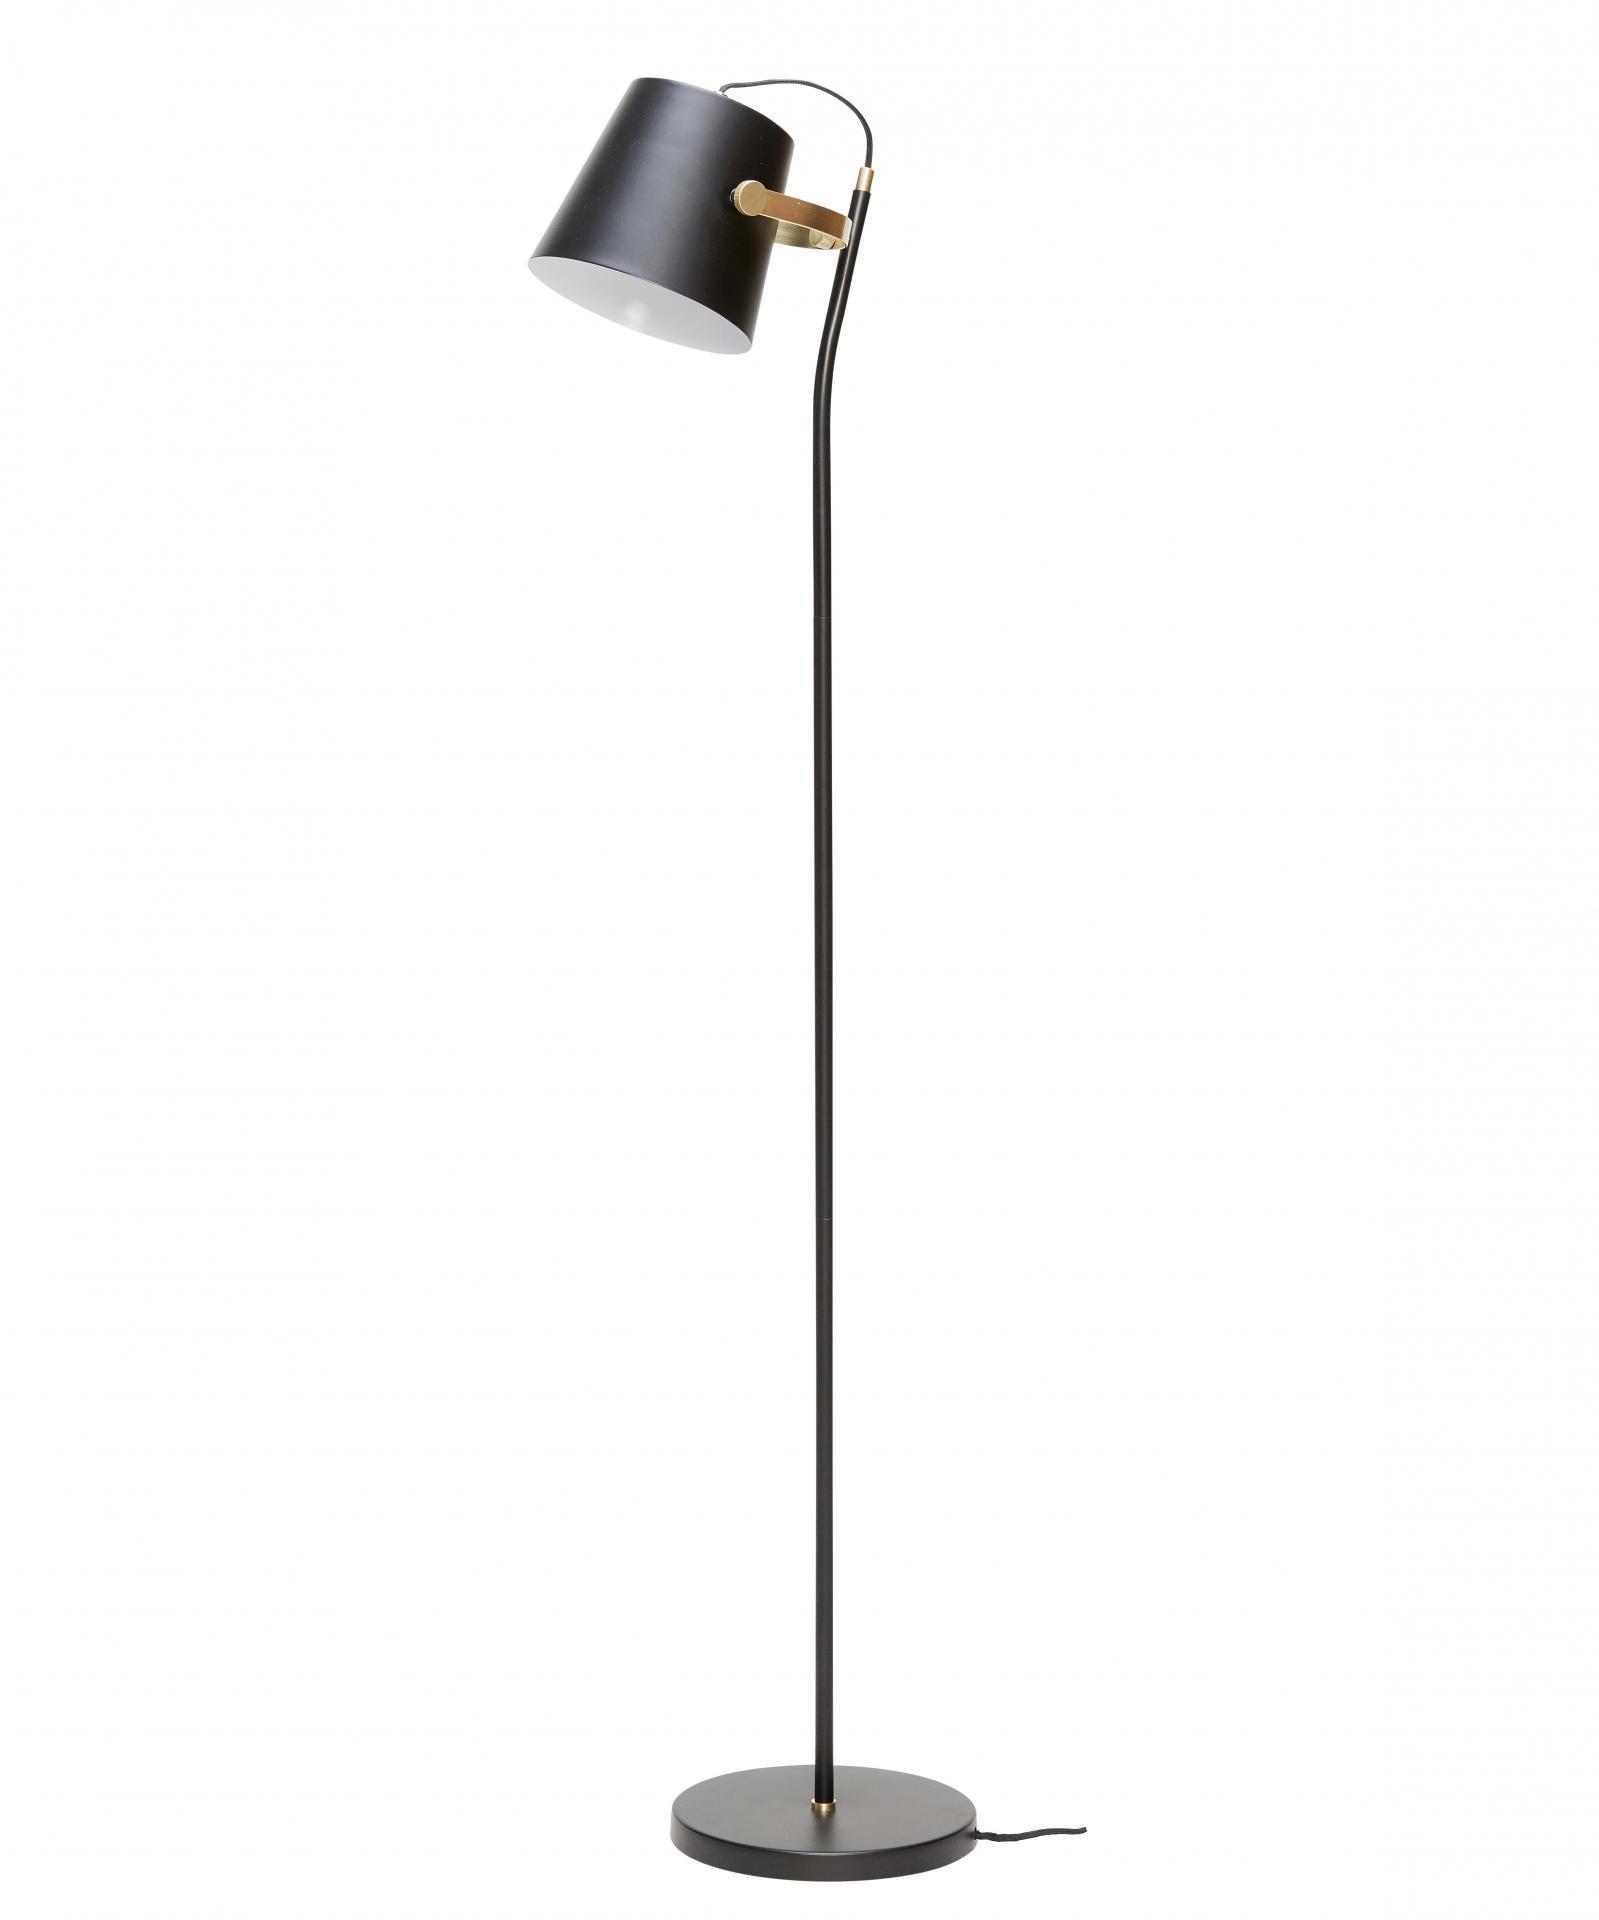 Hübsch Stojací lampa Black/brass, černá barva, zlatá barva, kov